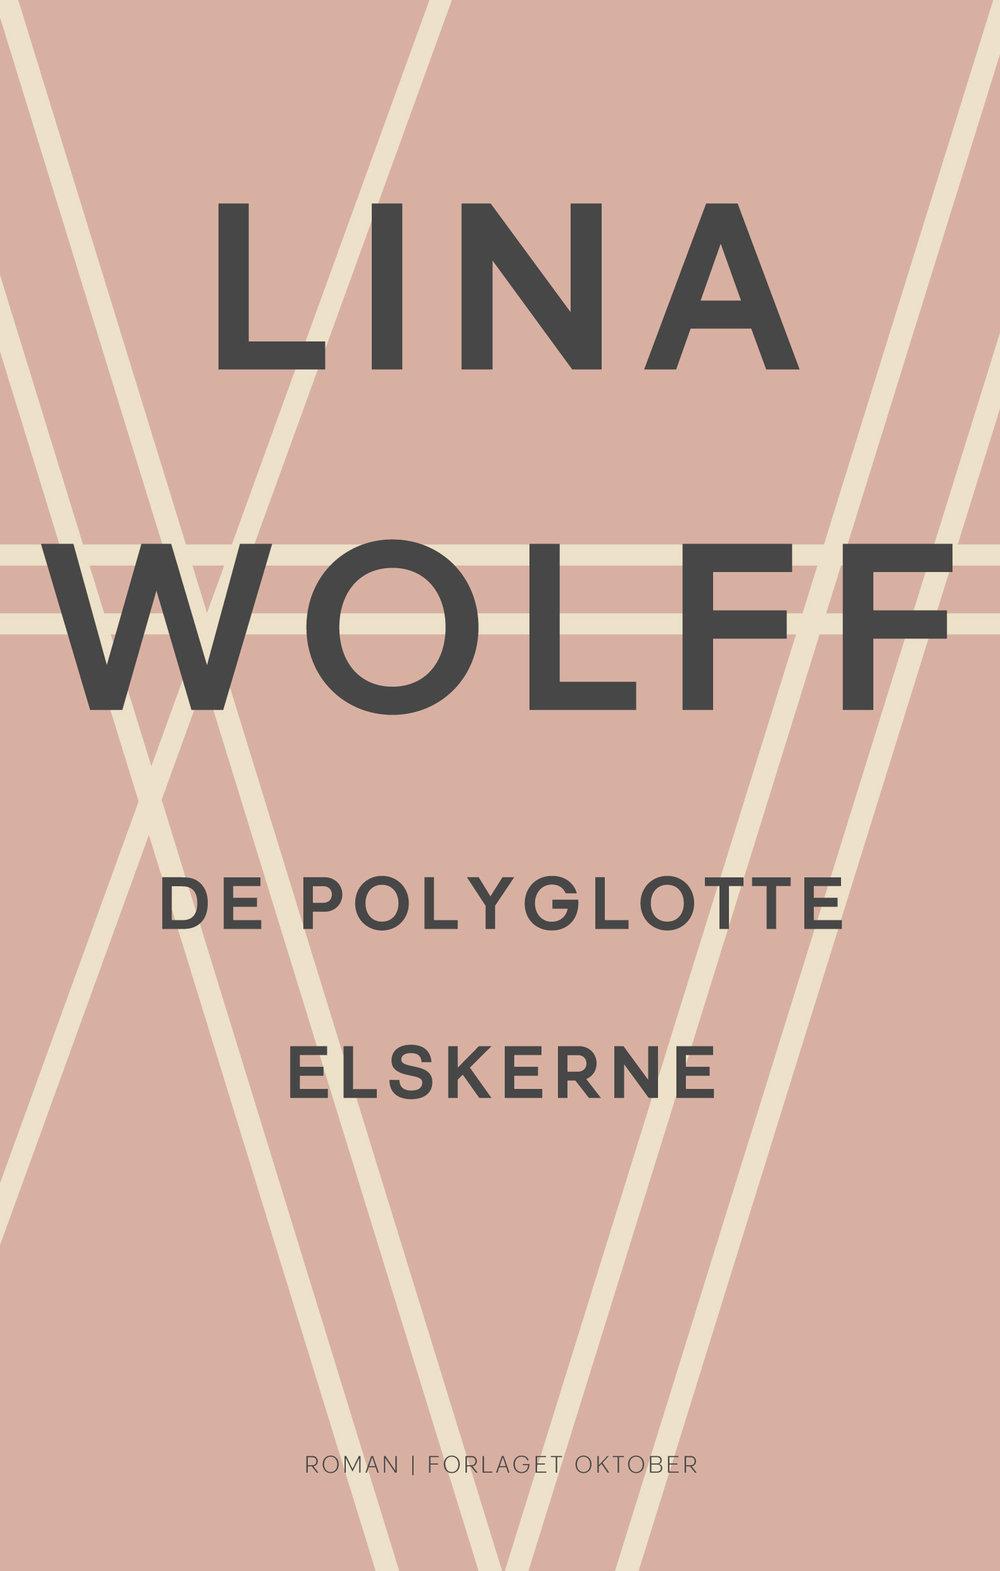 linawolff.jpg